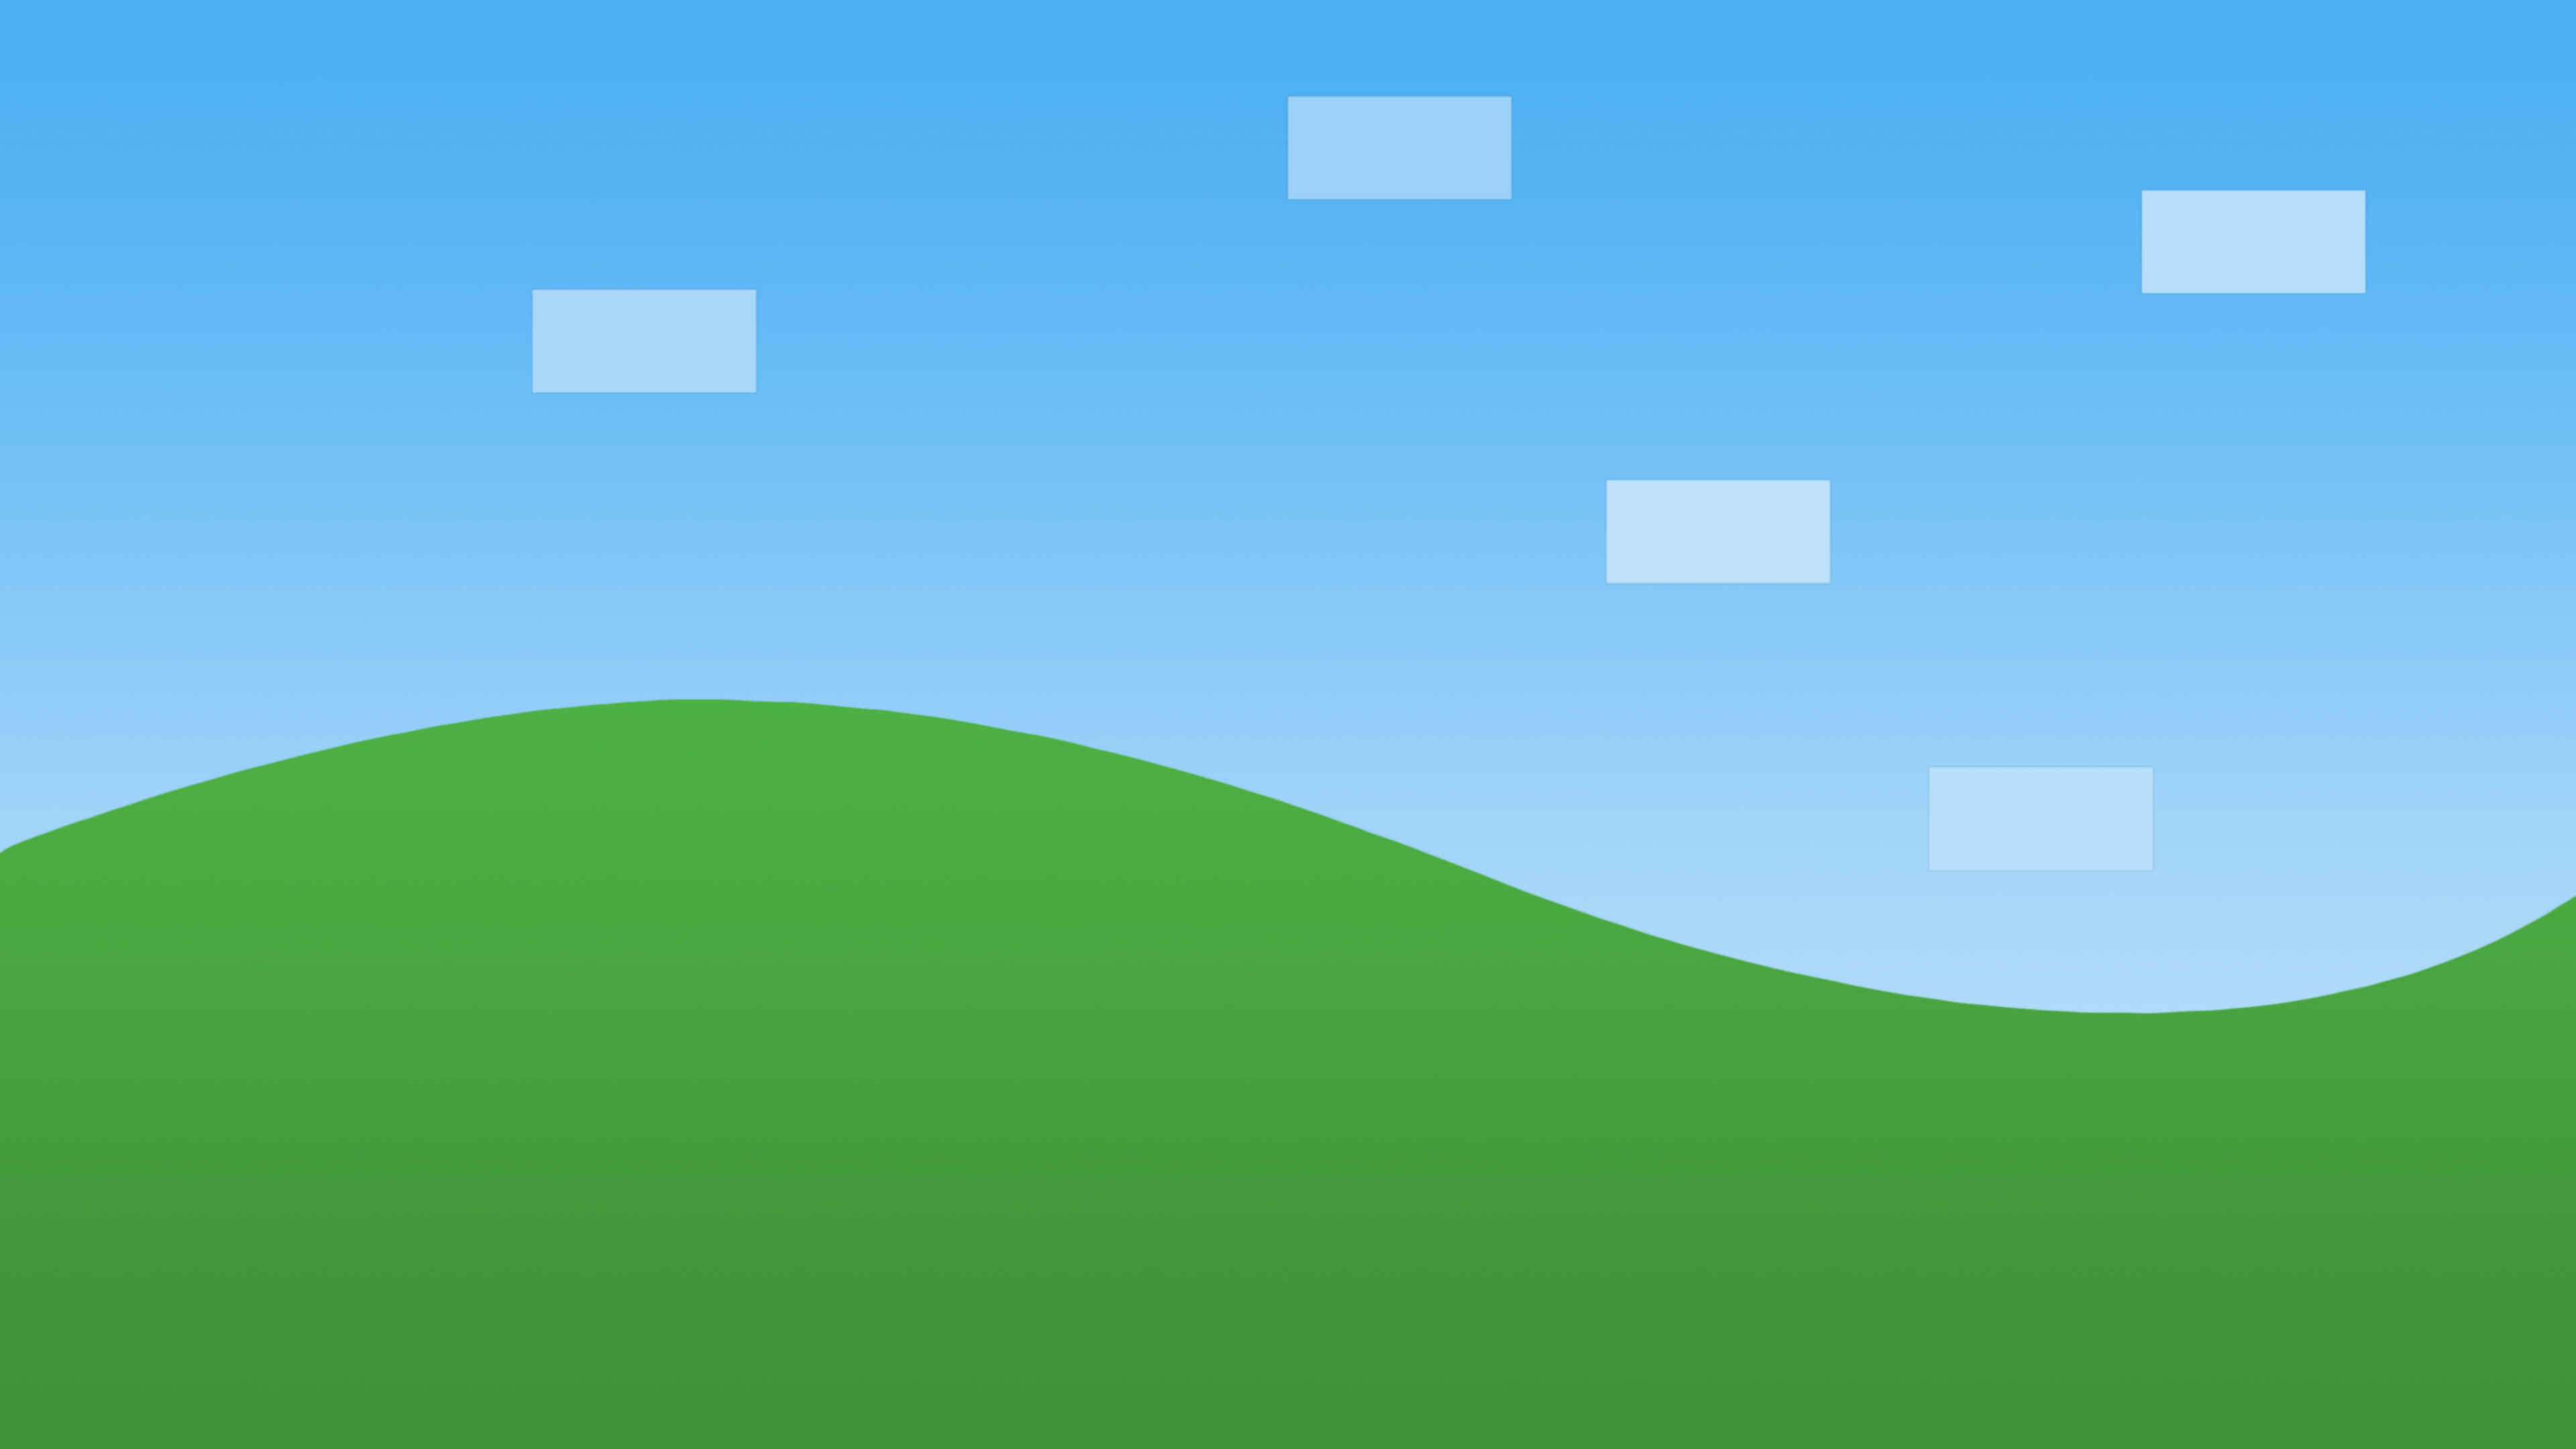 Minimal landscape 4k wallpaper by rv770 on deviantart for Minimal art landscape